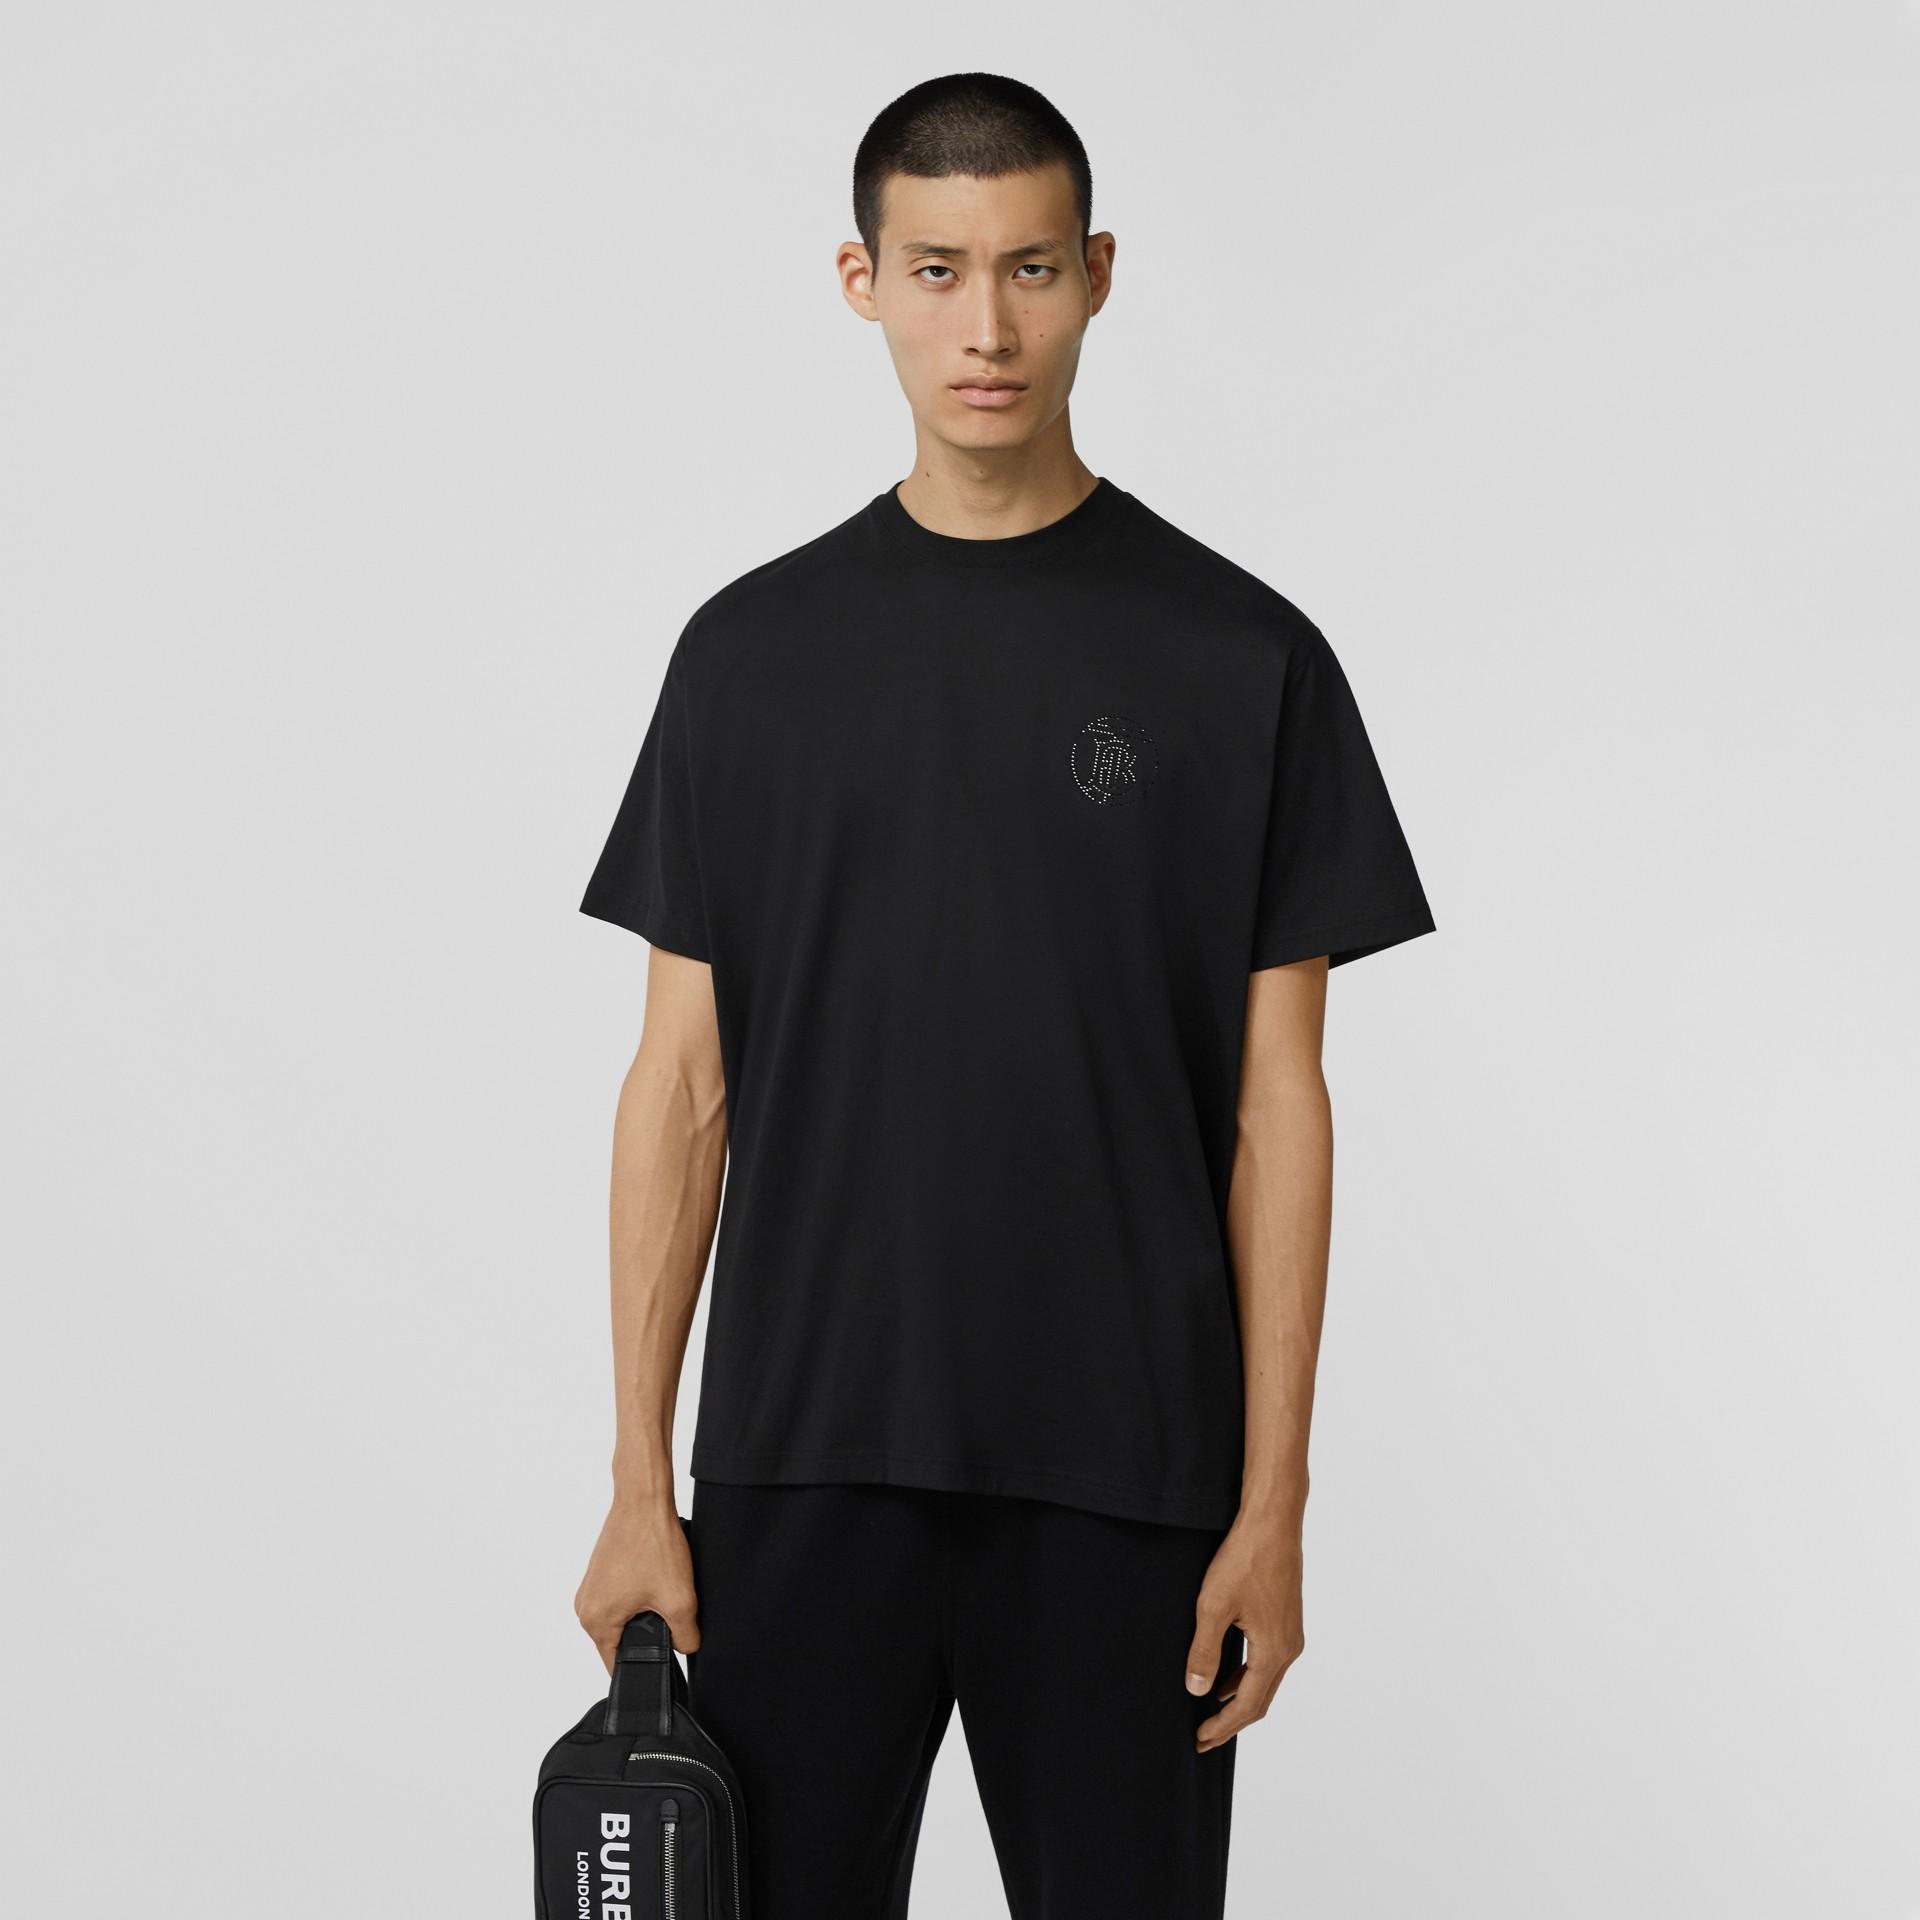 Crystal Monogram Motif Cotton Oversized T-shirt in Black - Men | Burberry - gallery image 4